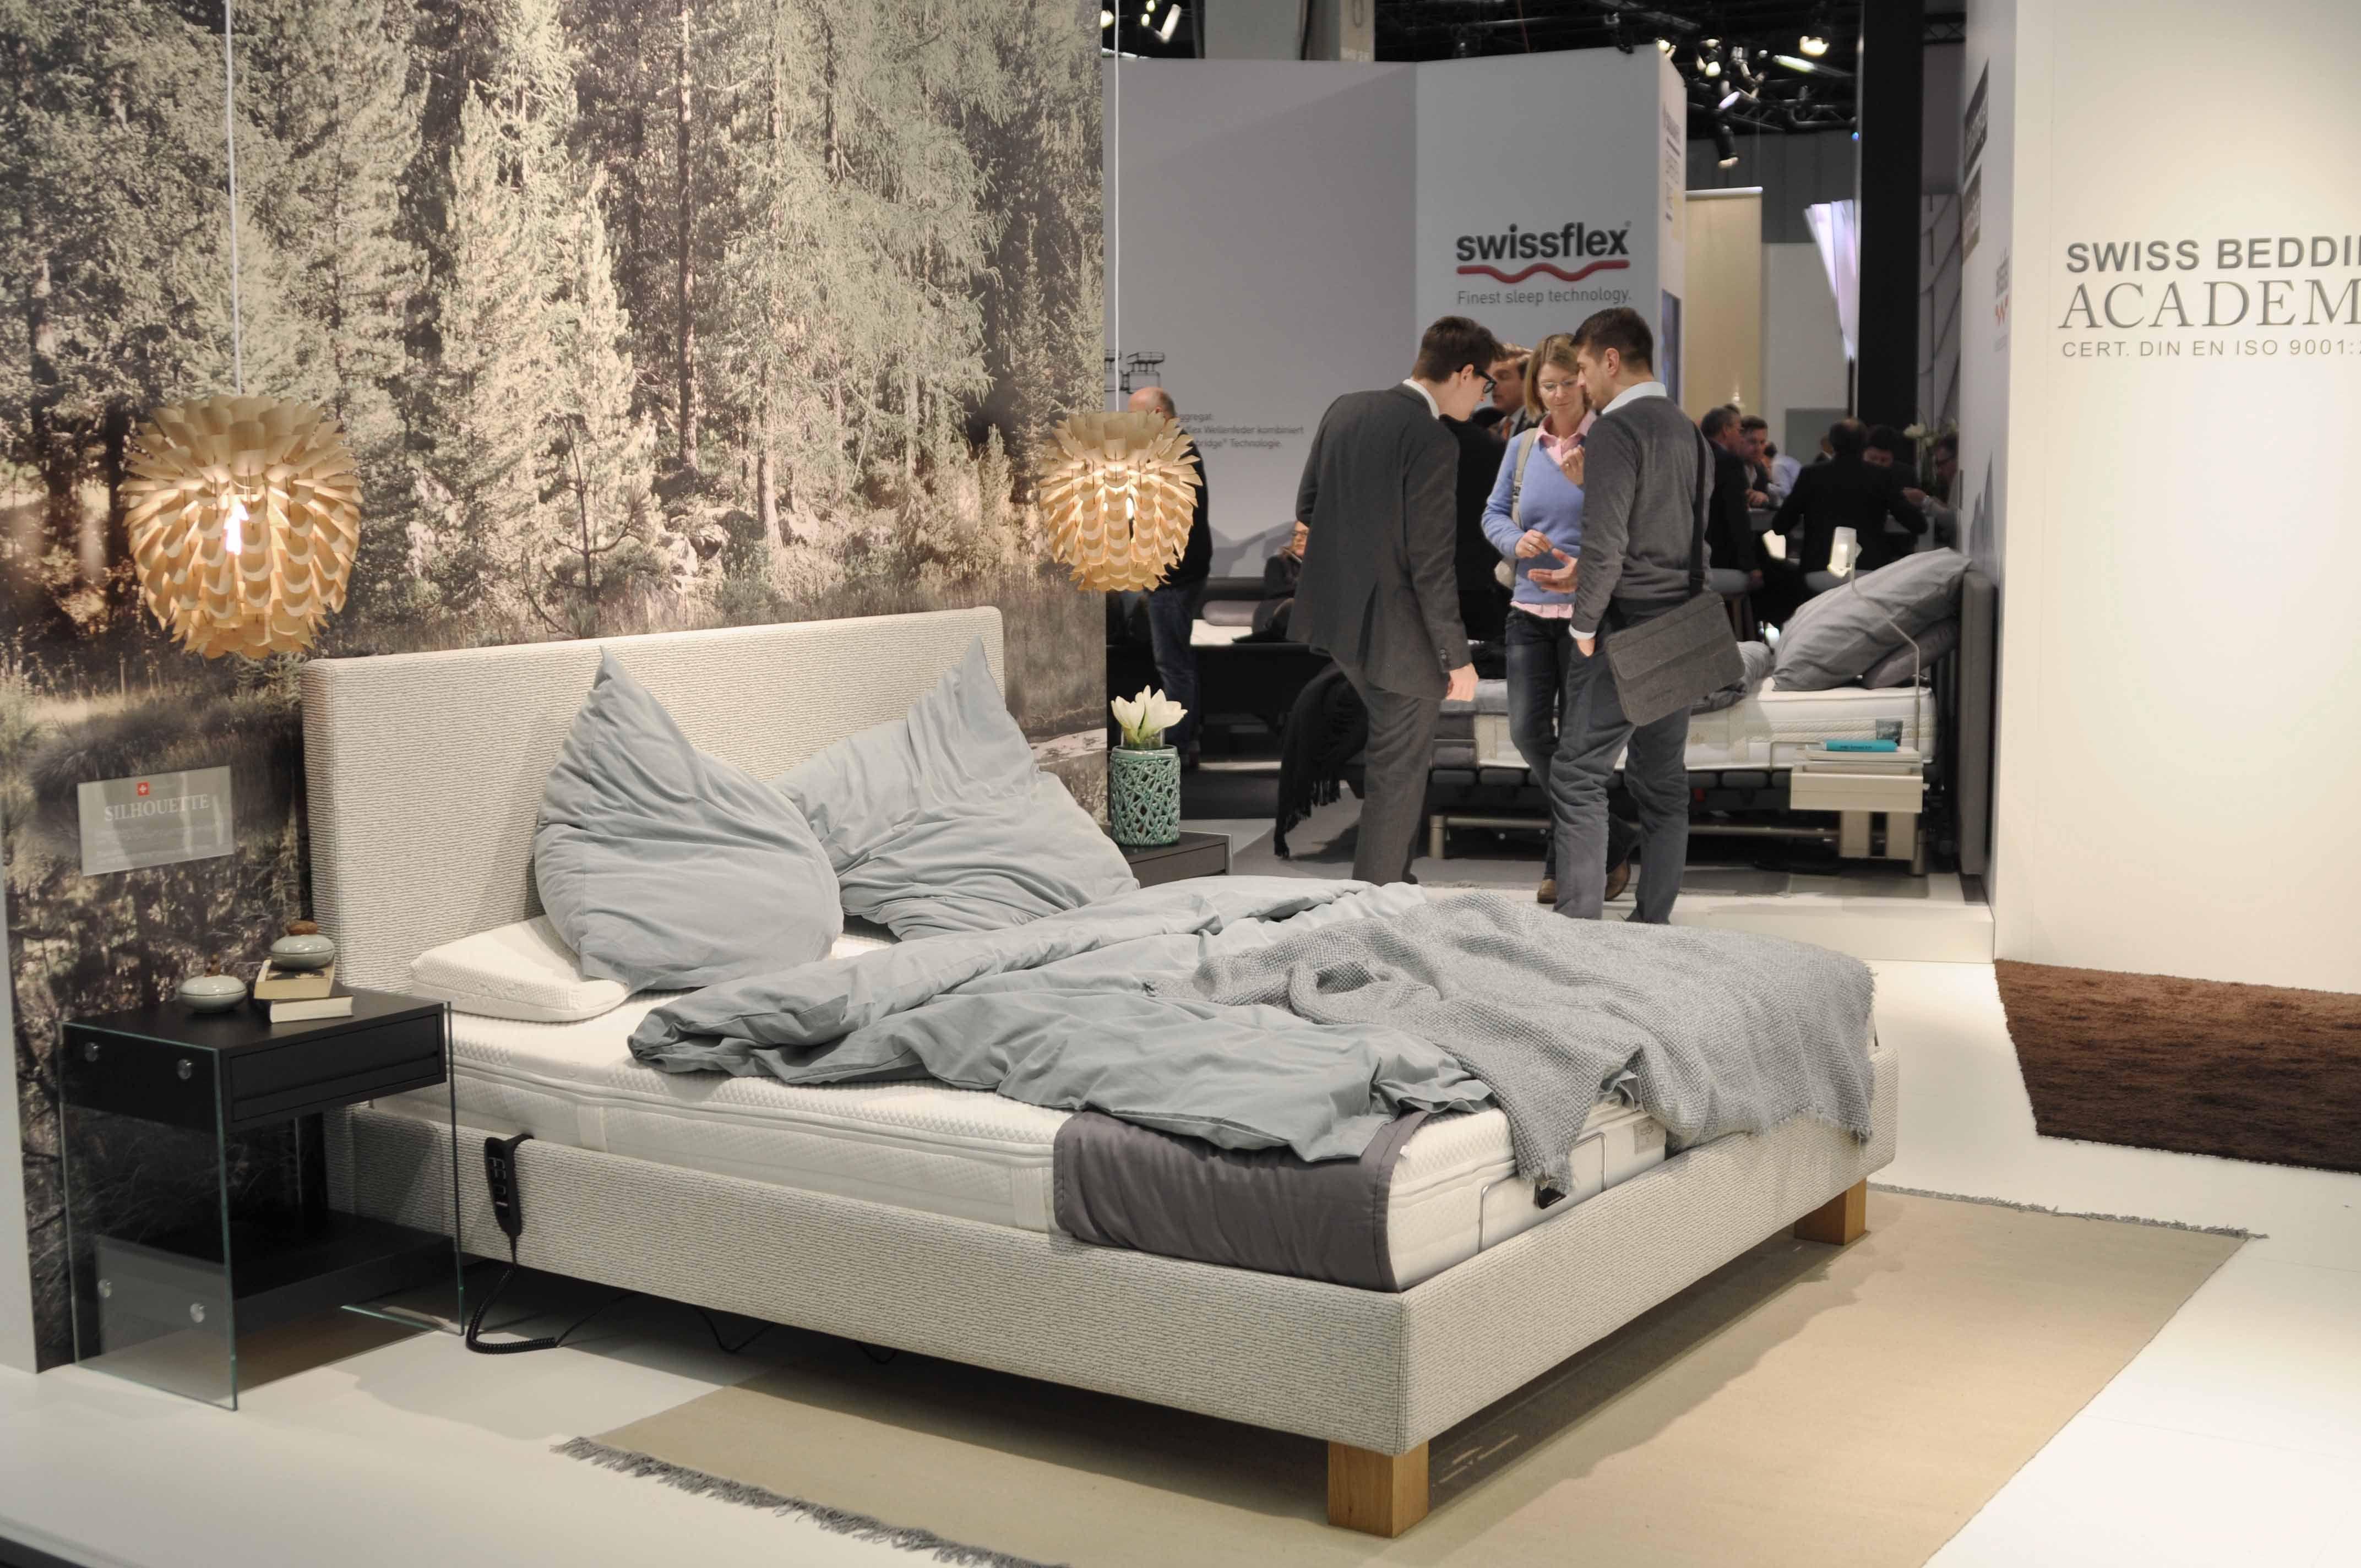 Pin By Swissflex On Imm Cologne 2016 Furniture Decor Home Decor